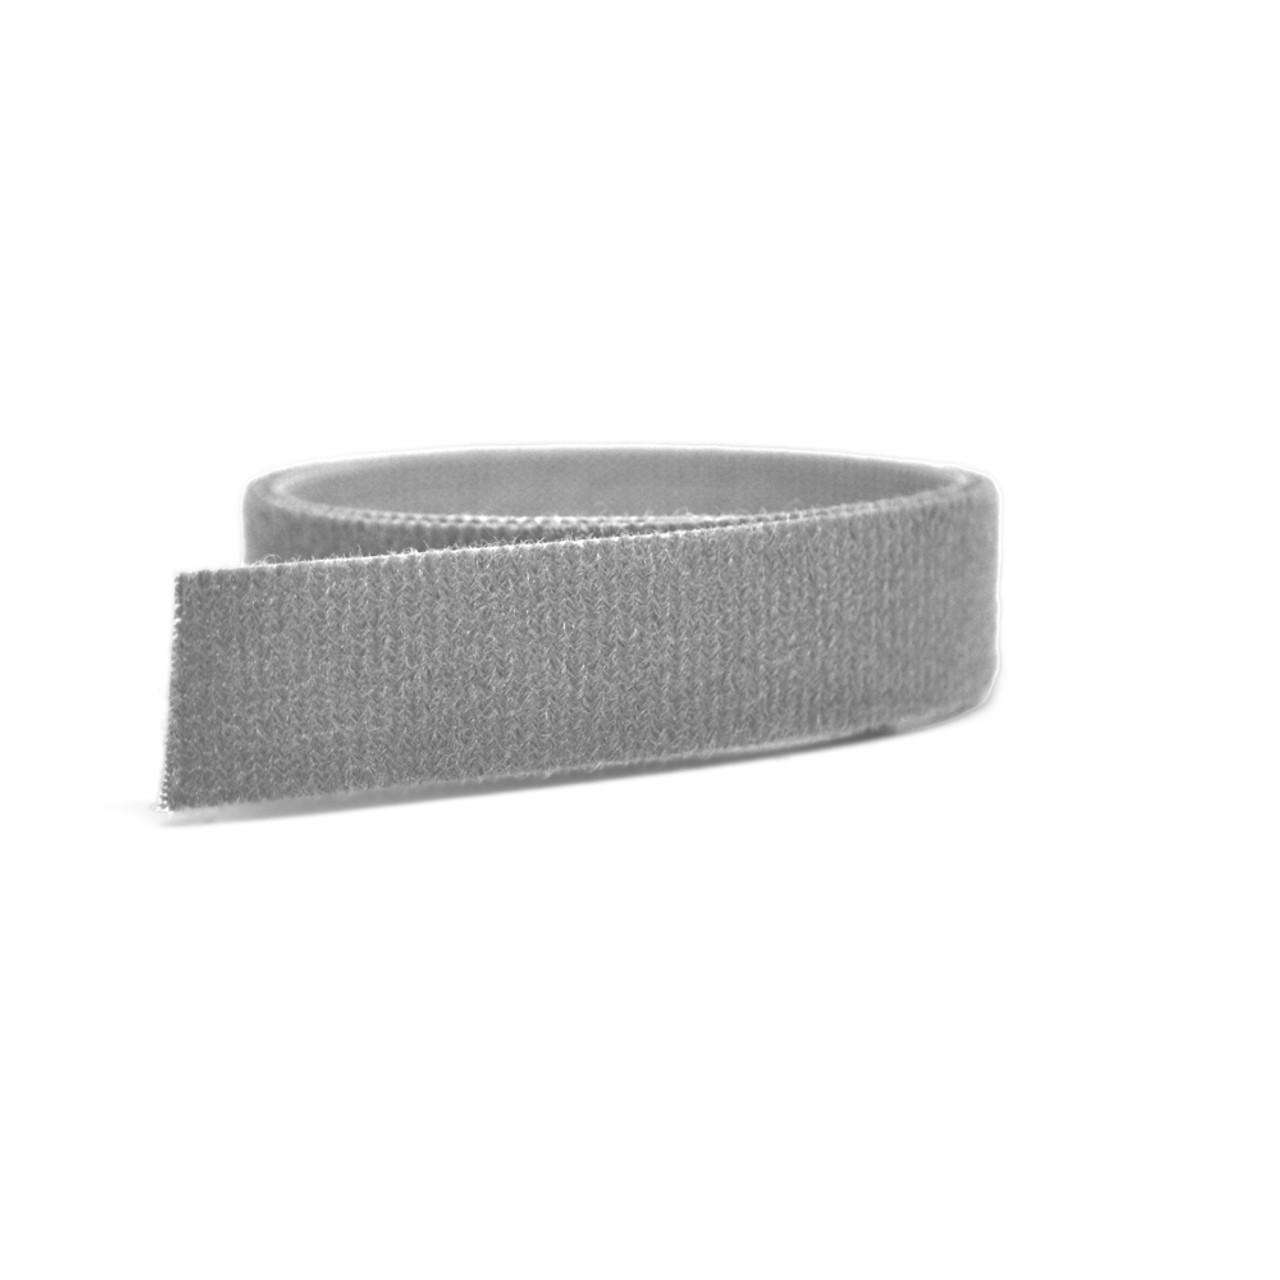 VELCRO® Brand ONE-WRAP® Gray Tape Mini Rolls